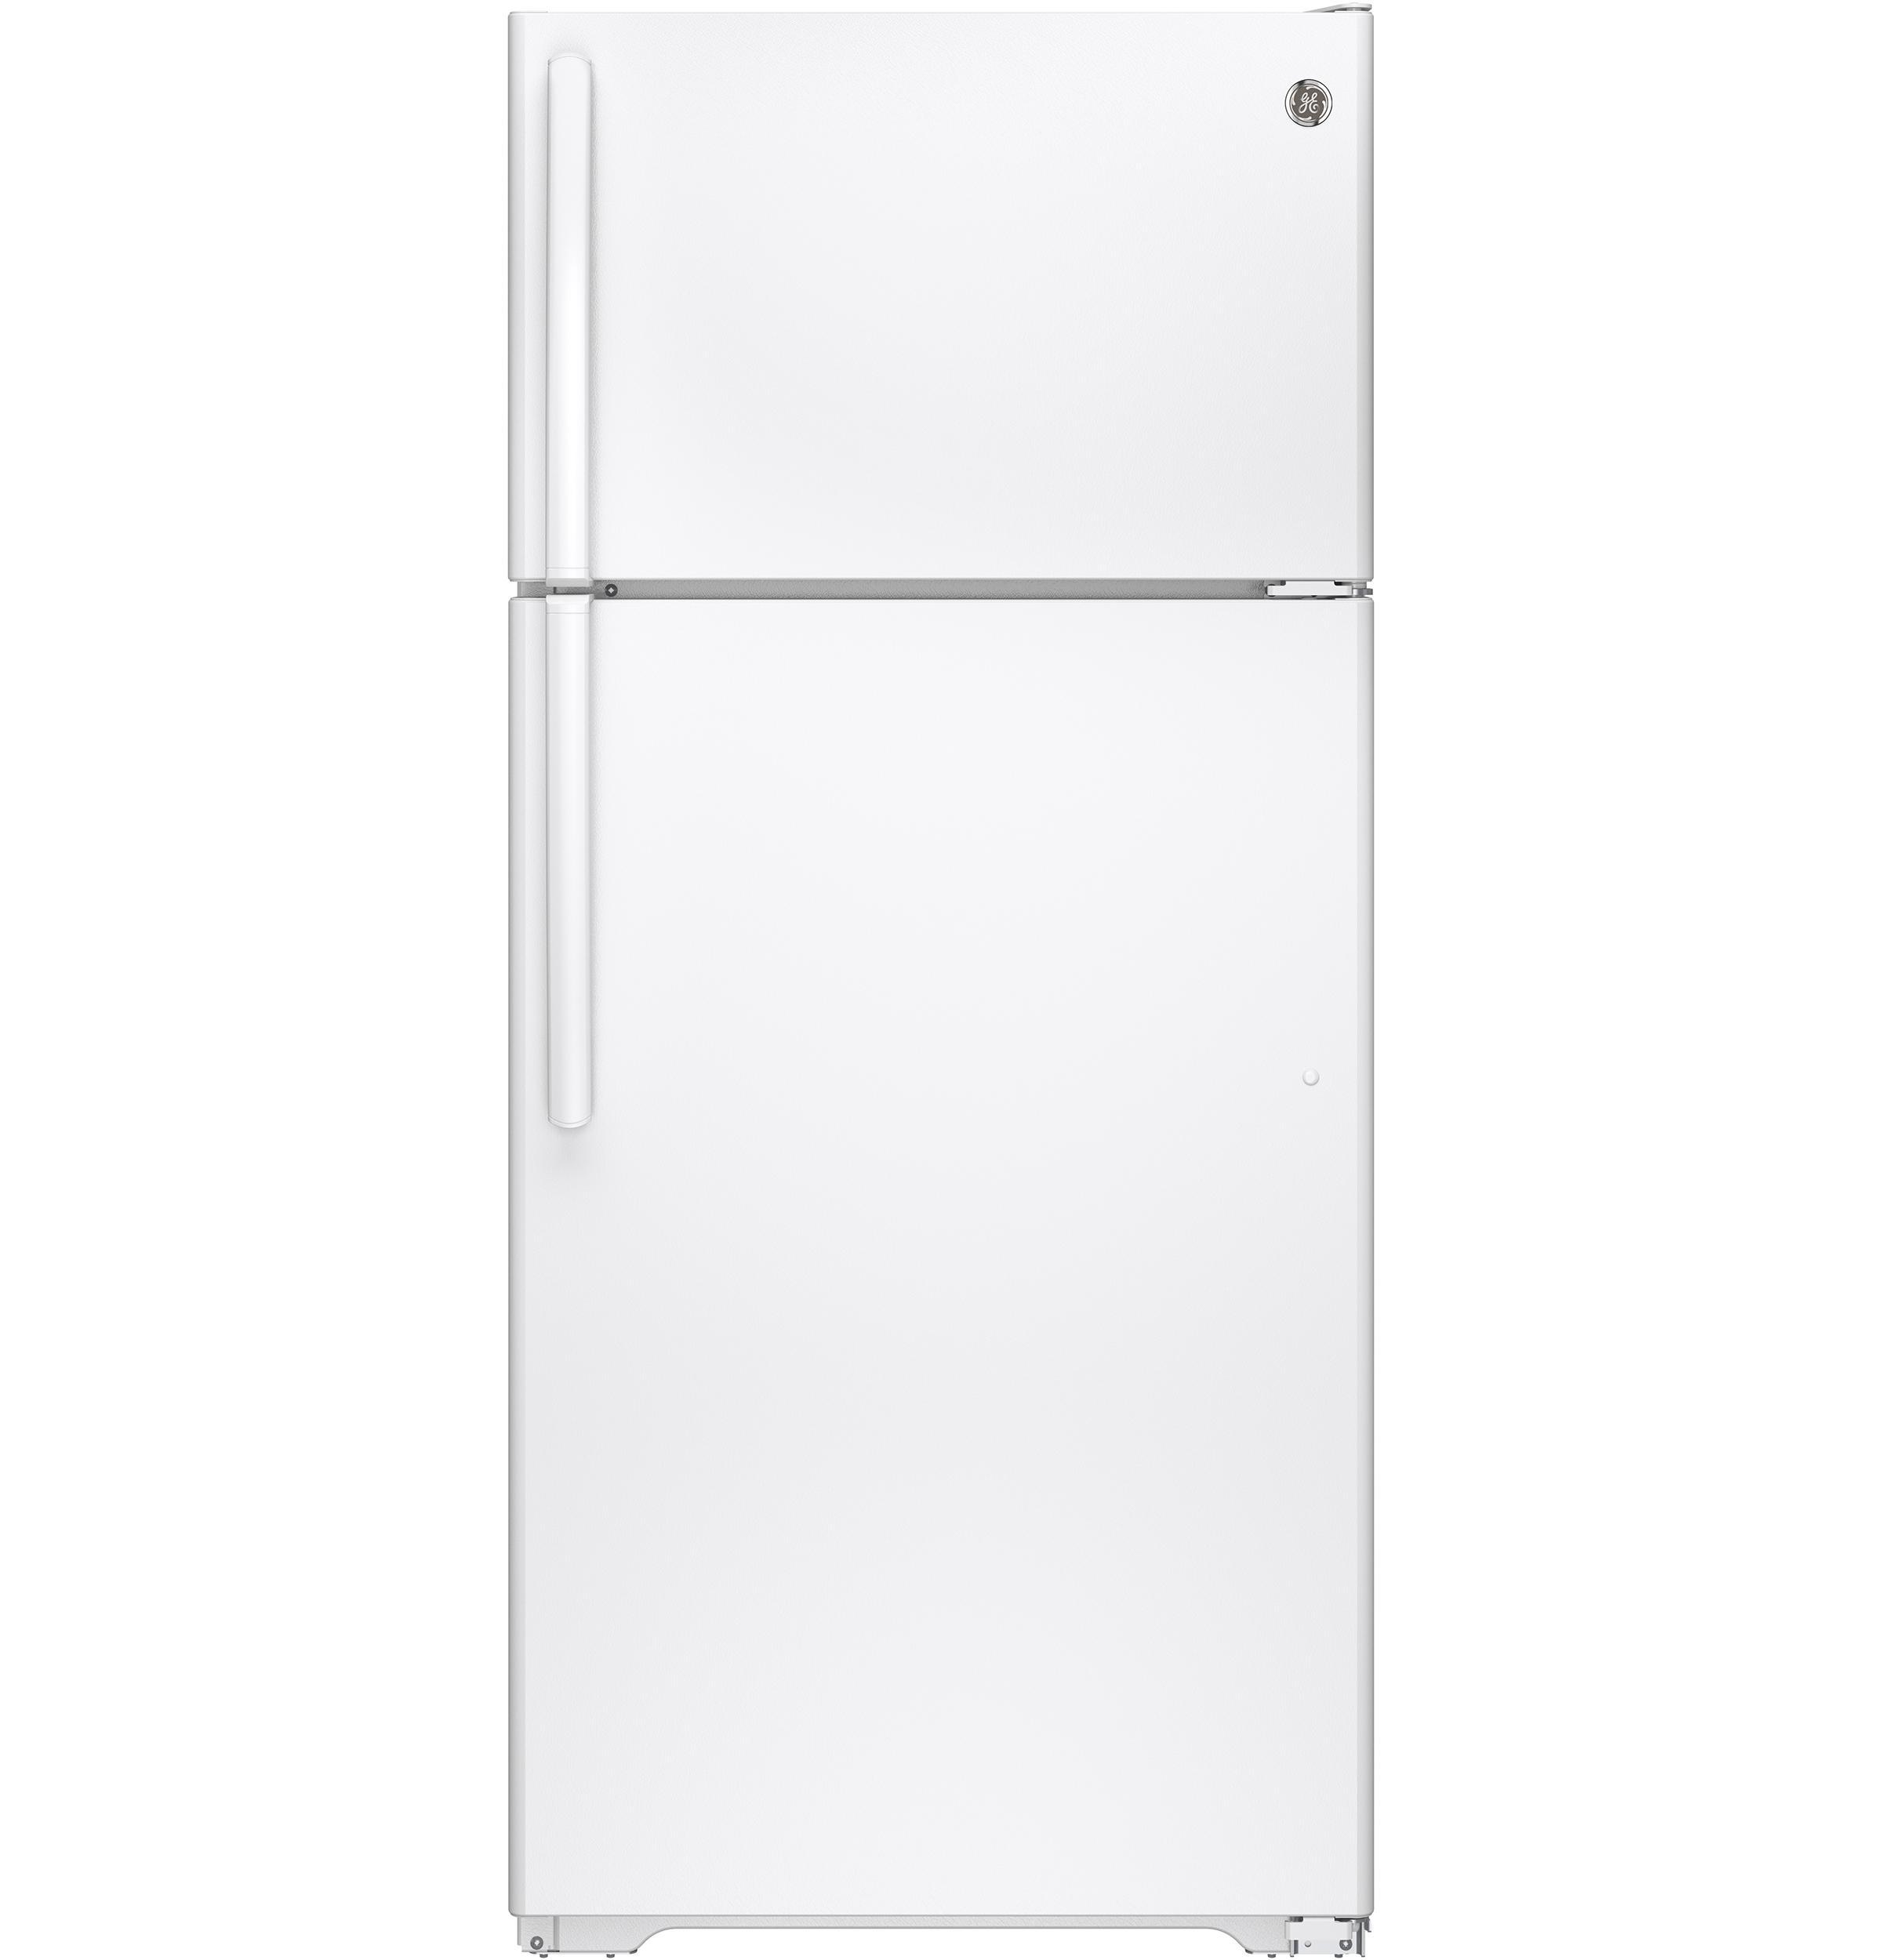 GE15.5 Cu. Ft. Top-Freezer Refrigerator